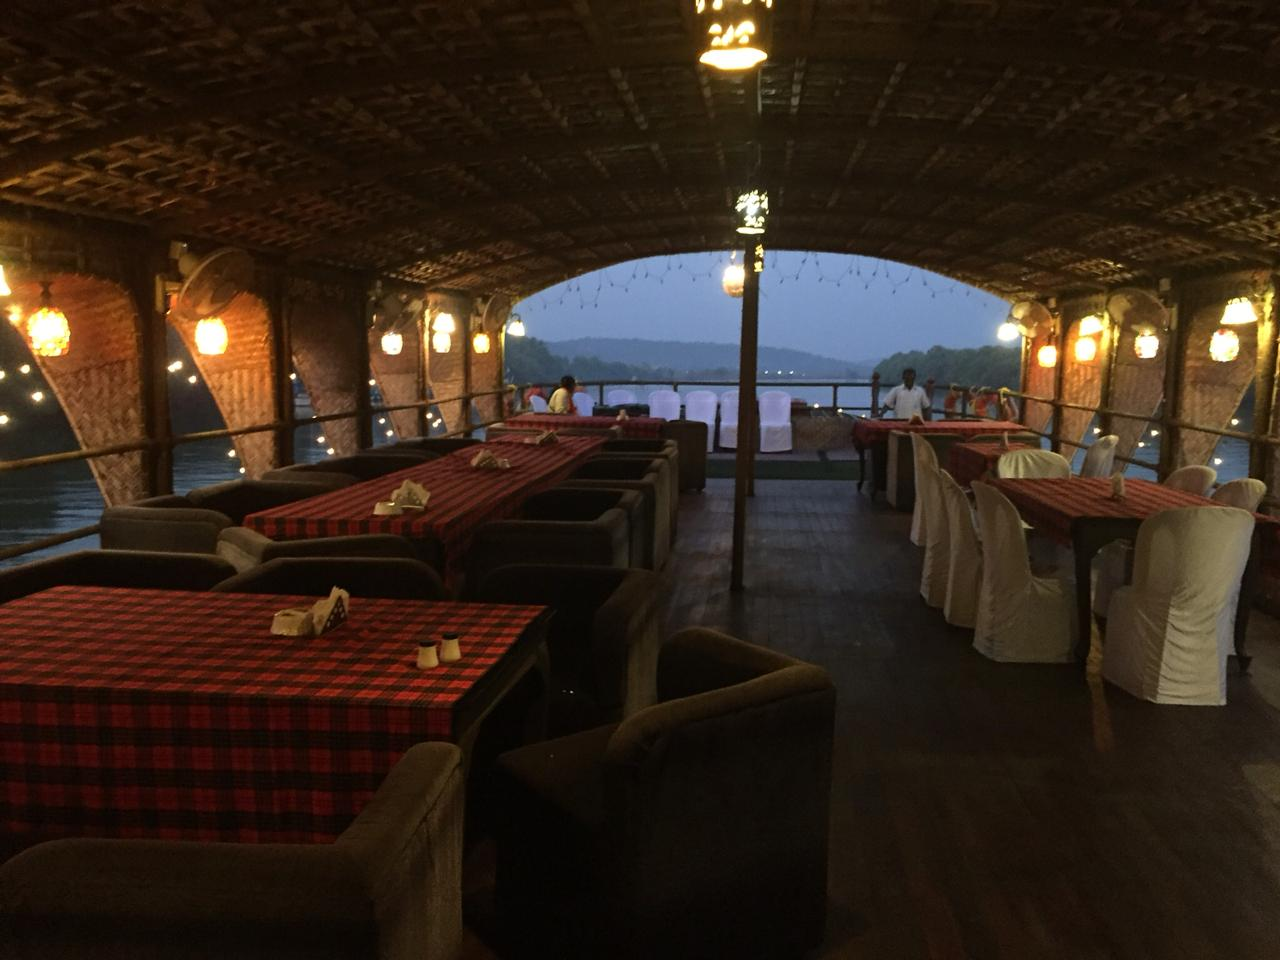 Dinner Cruise - 5 Top Cruise to Take in Goa